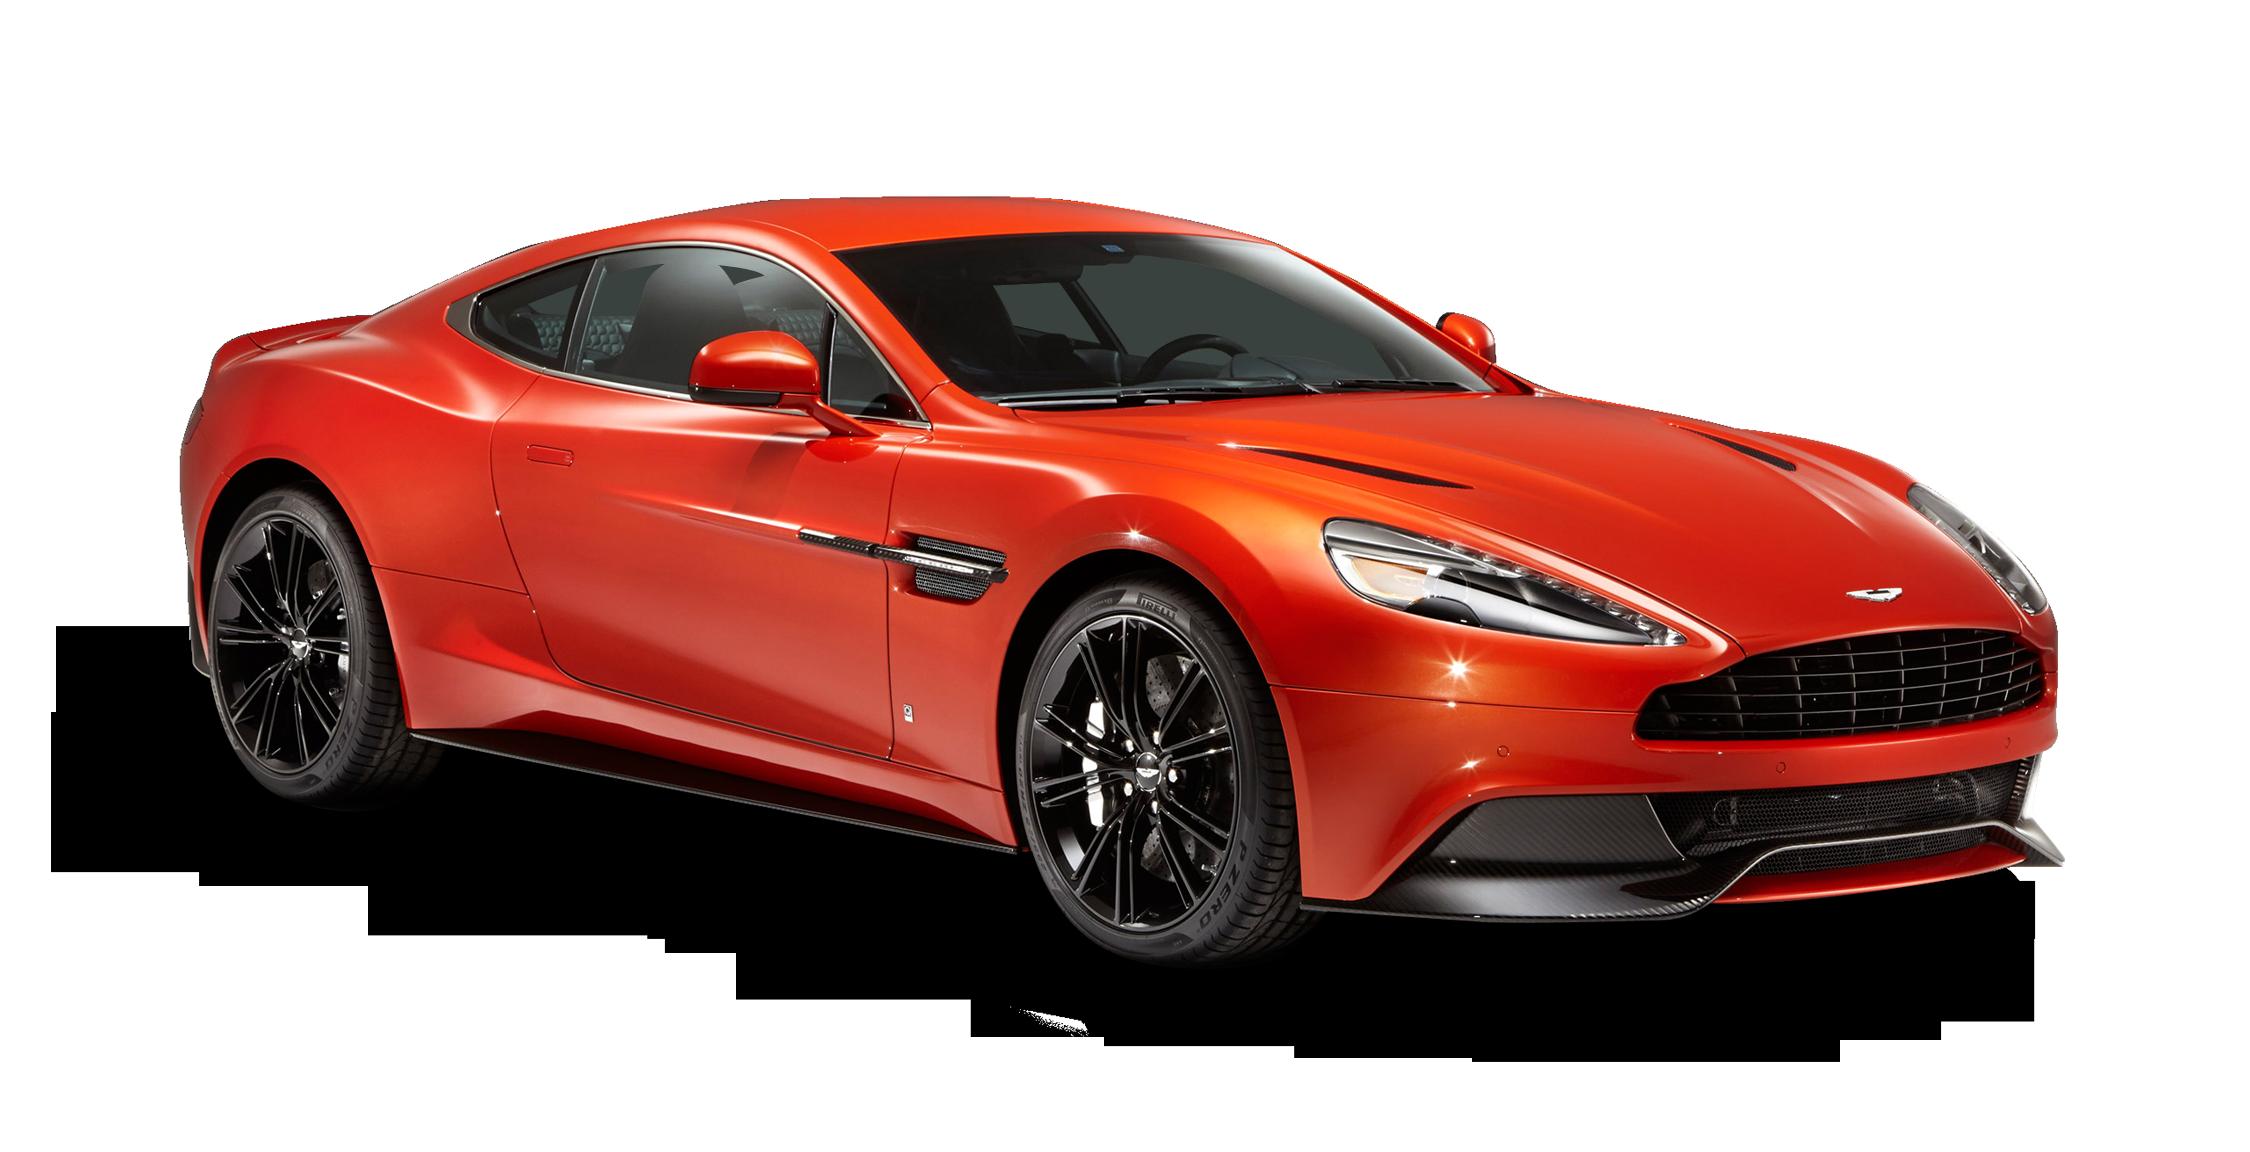 Aston Martin Vanquish Red Car PNG Image.